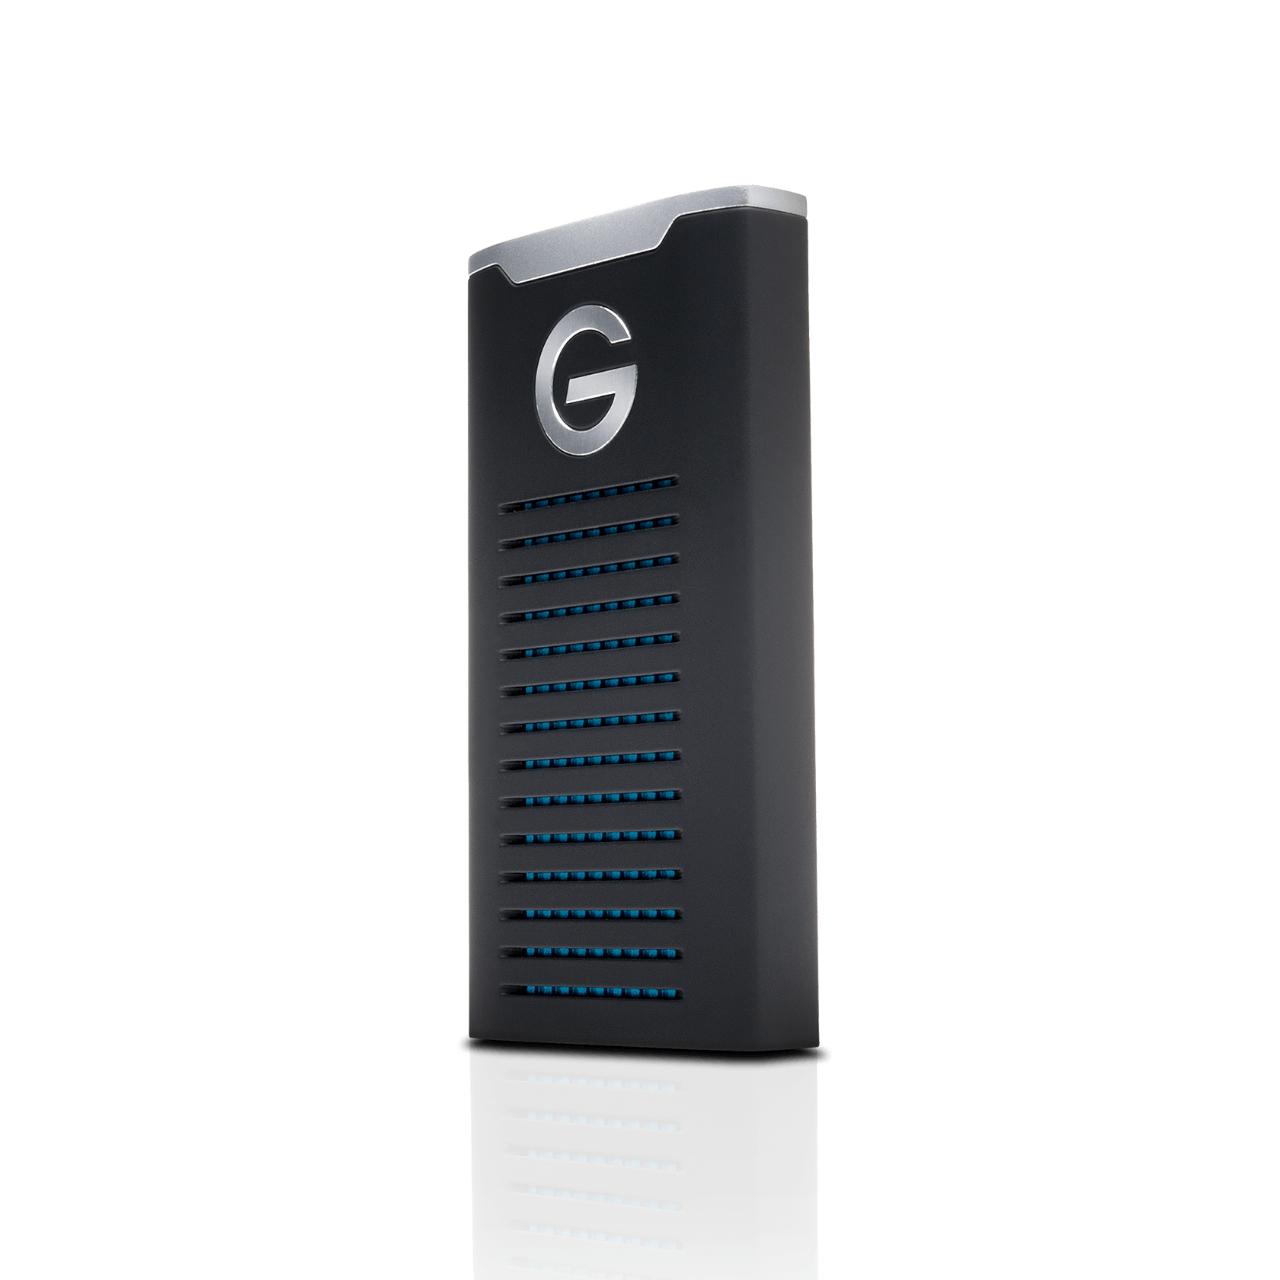 G-Technology G-DRIVE Mobile SSD 1000 GB Black